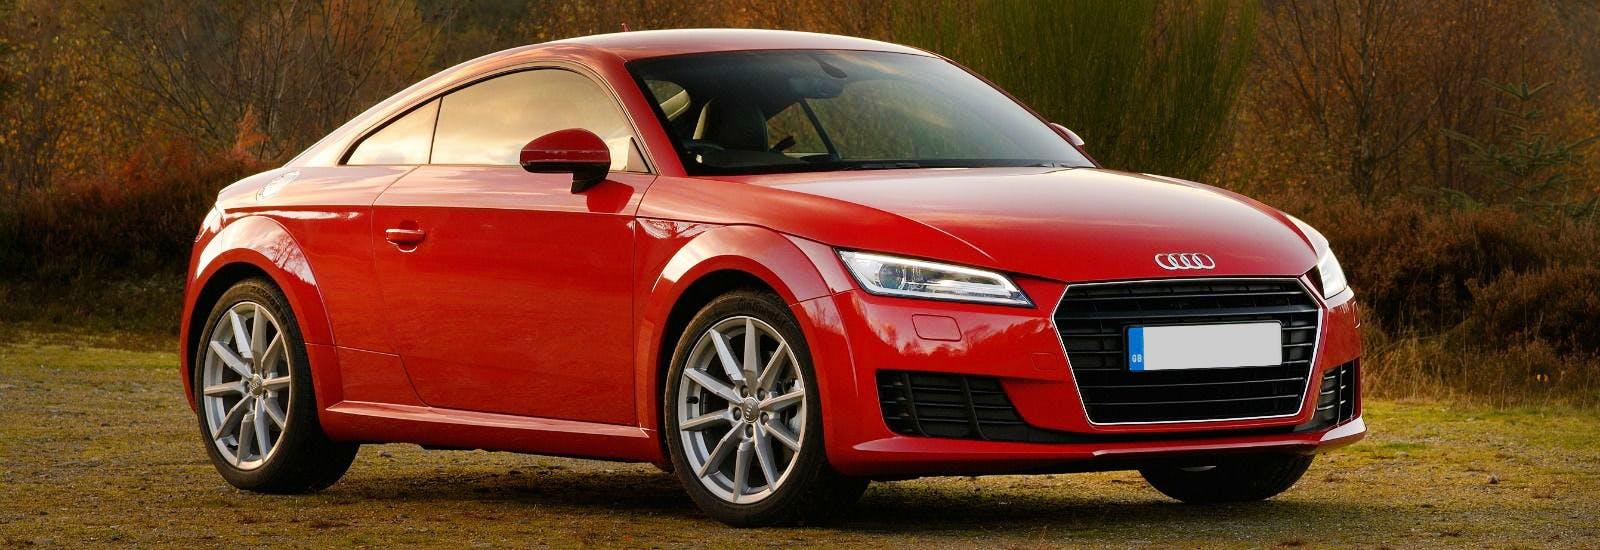 Alternative Modern WRC Rally Cars We'd Like To See